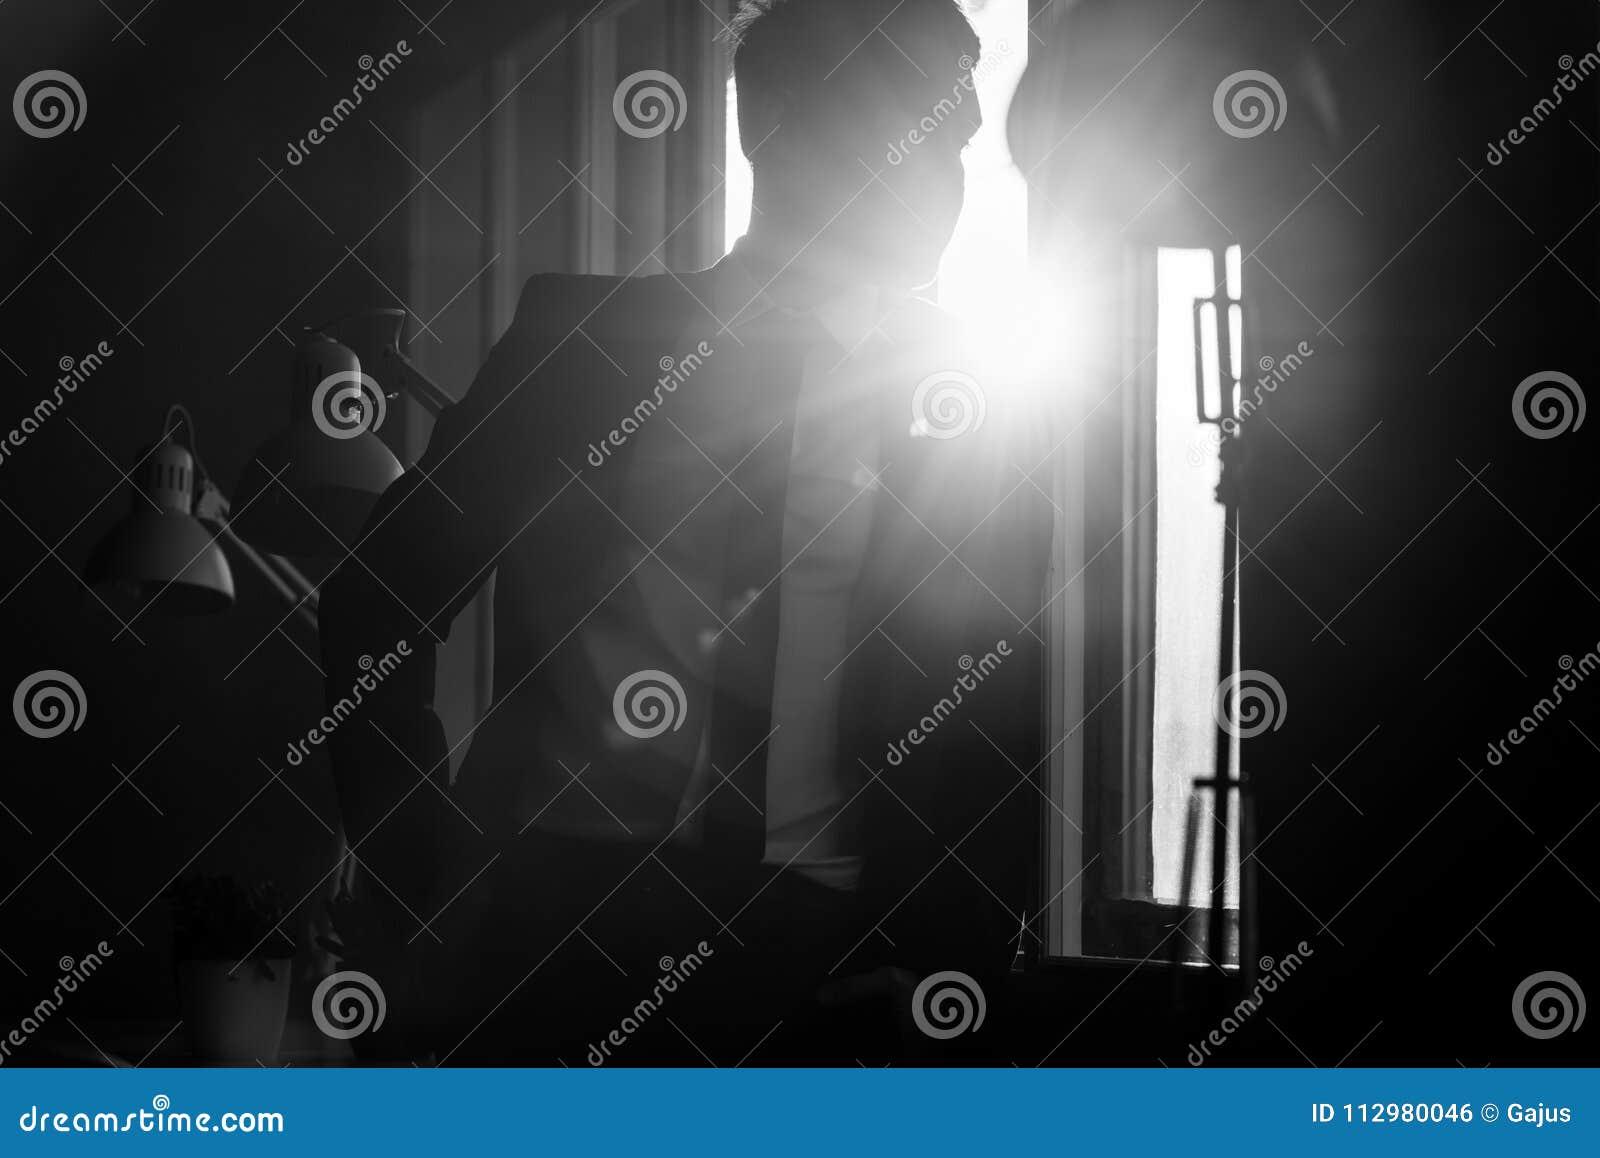 Businessman in a shadowy office